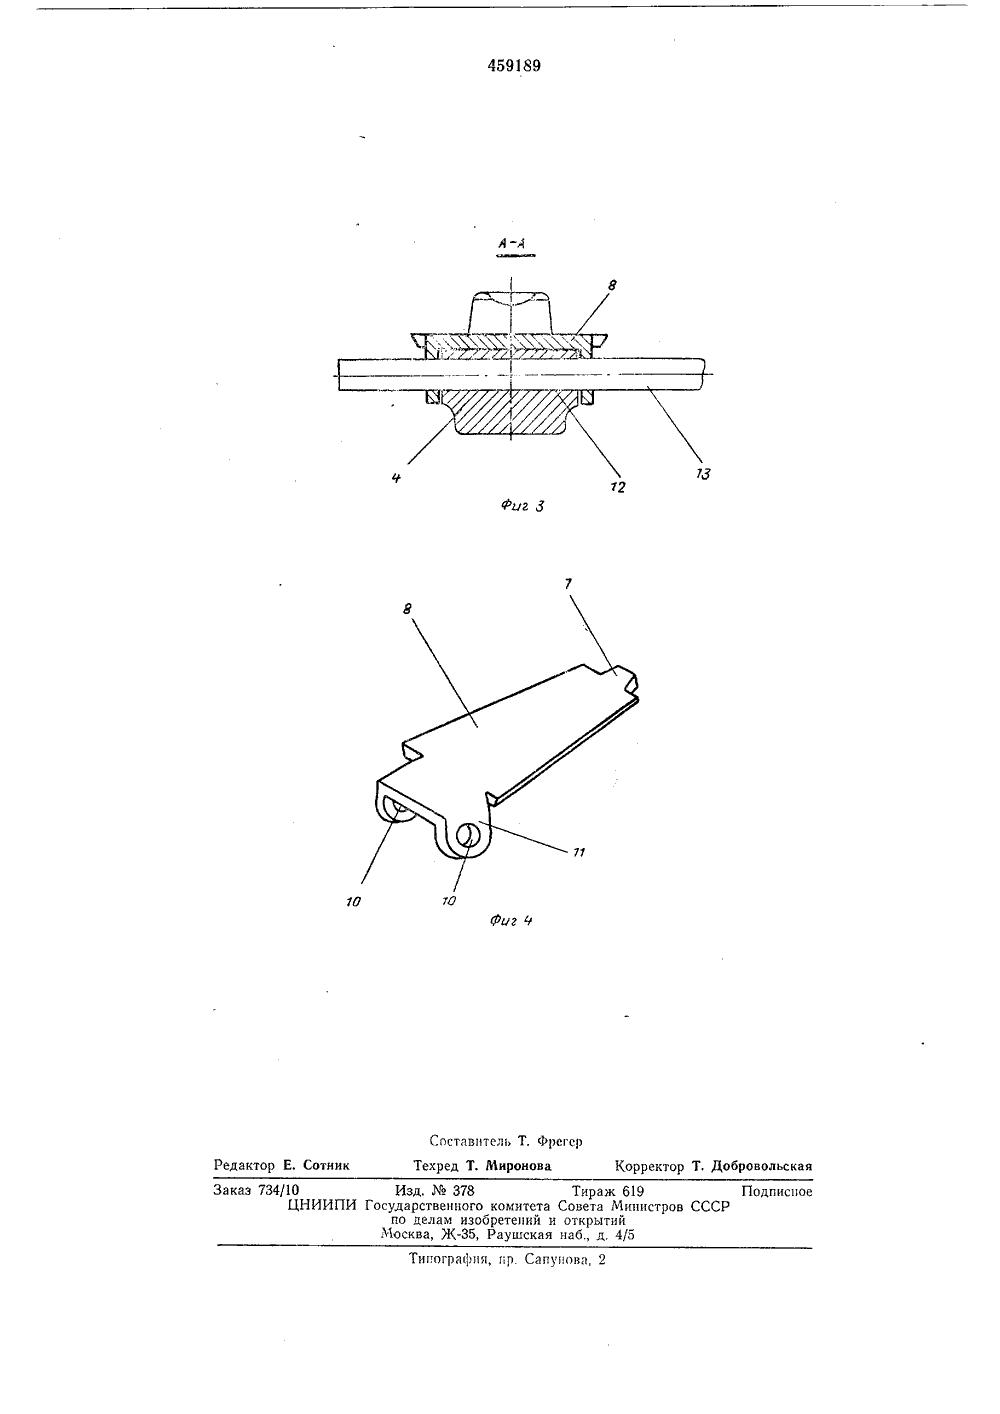 Схема режущего аппарата